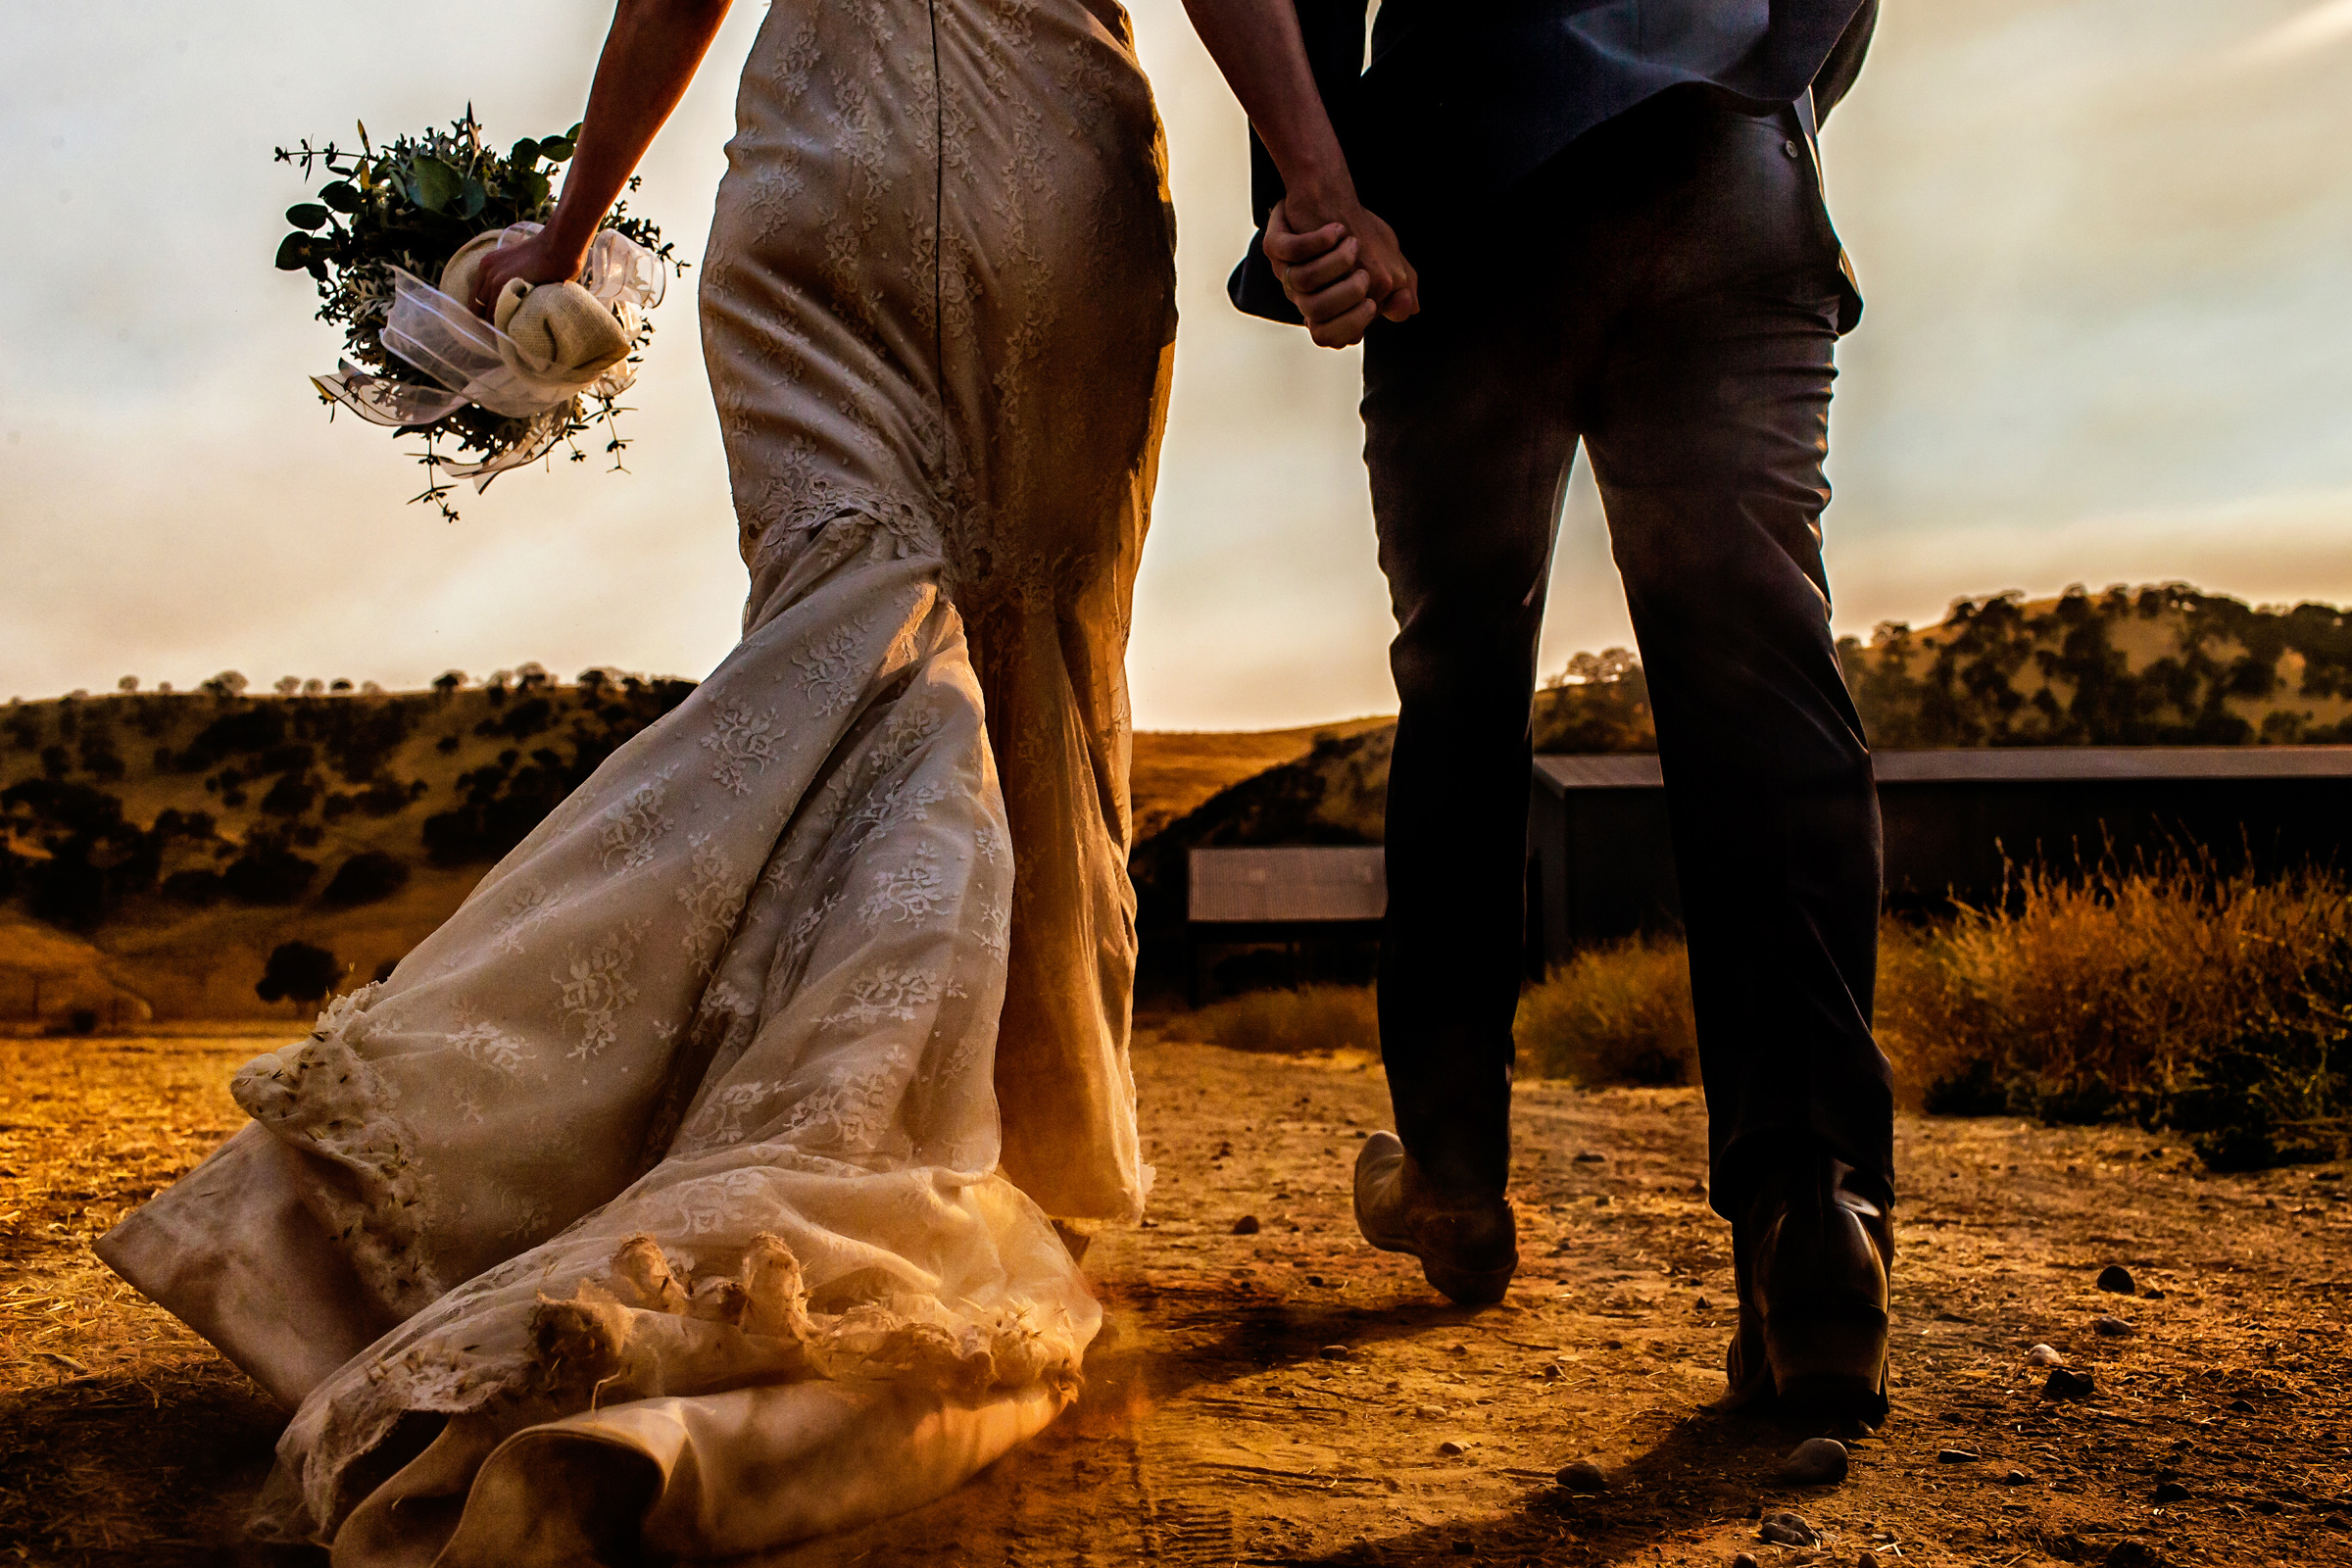 bride-and-groom-walking-away-photo-by-chrisman-studios